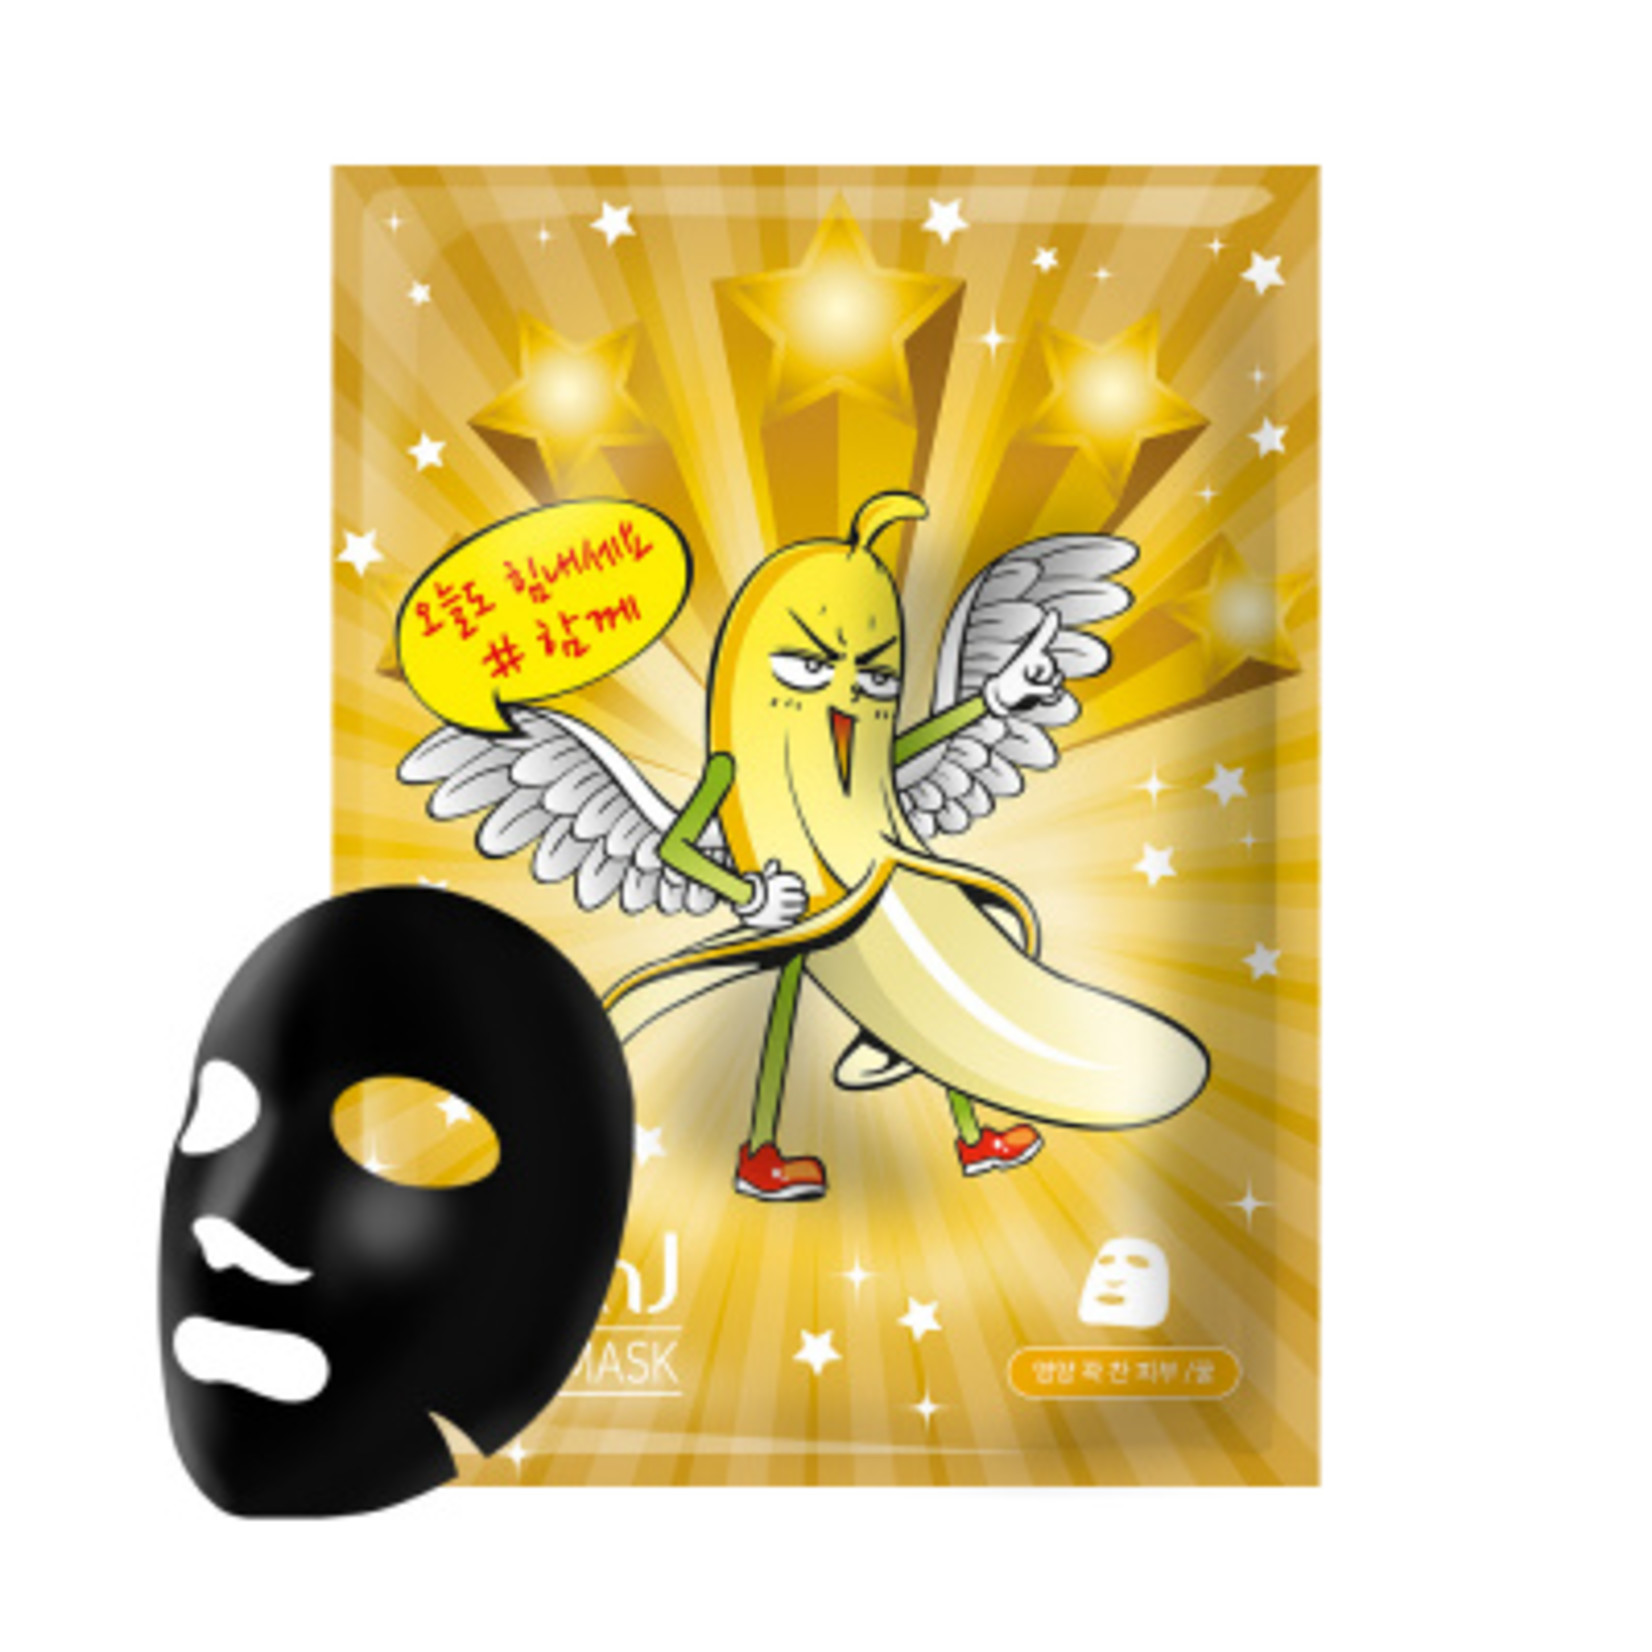 nohj Banana SSUL Maskpack [Honey]